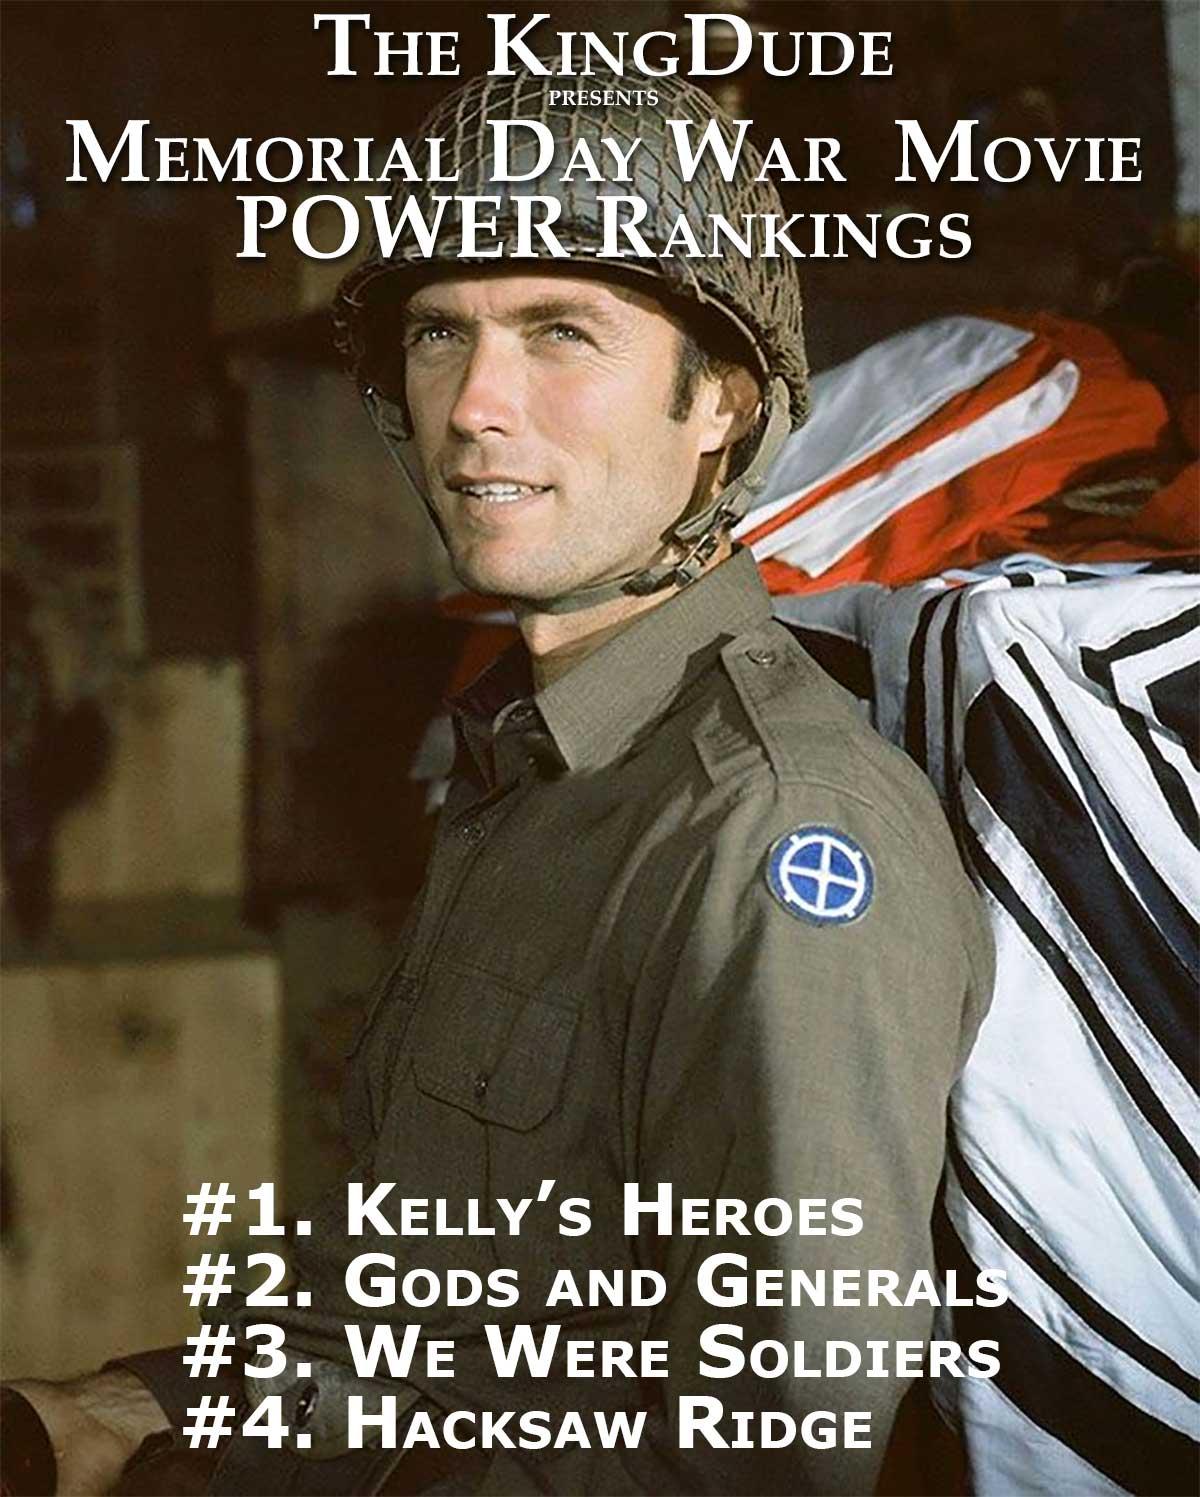 The KingDude Memorial Day War Movie Power Rankings